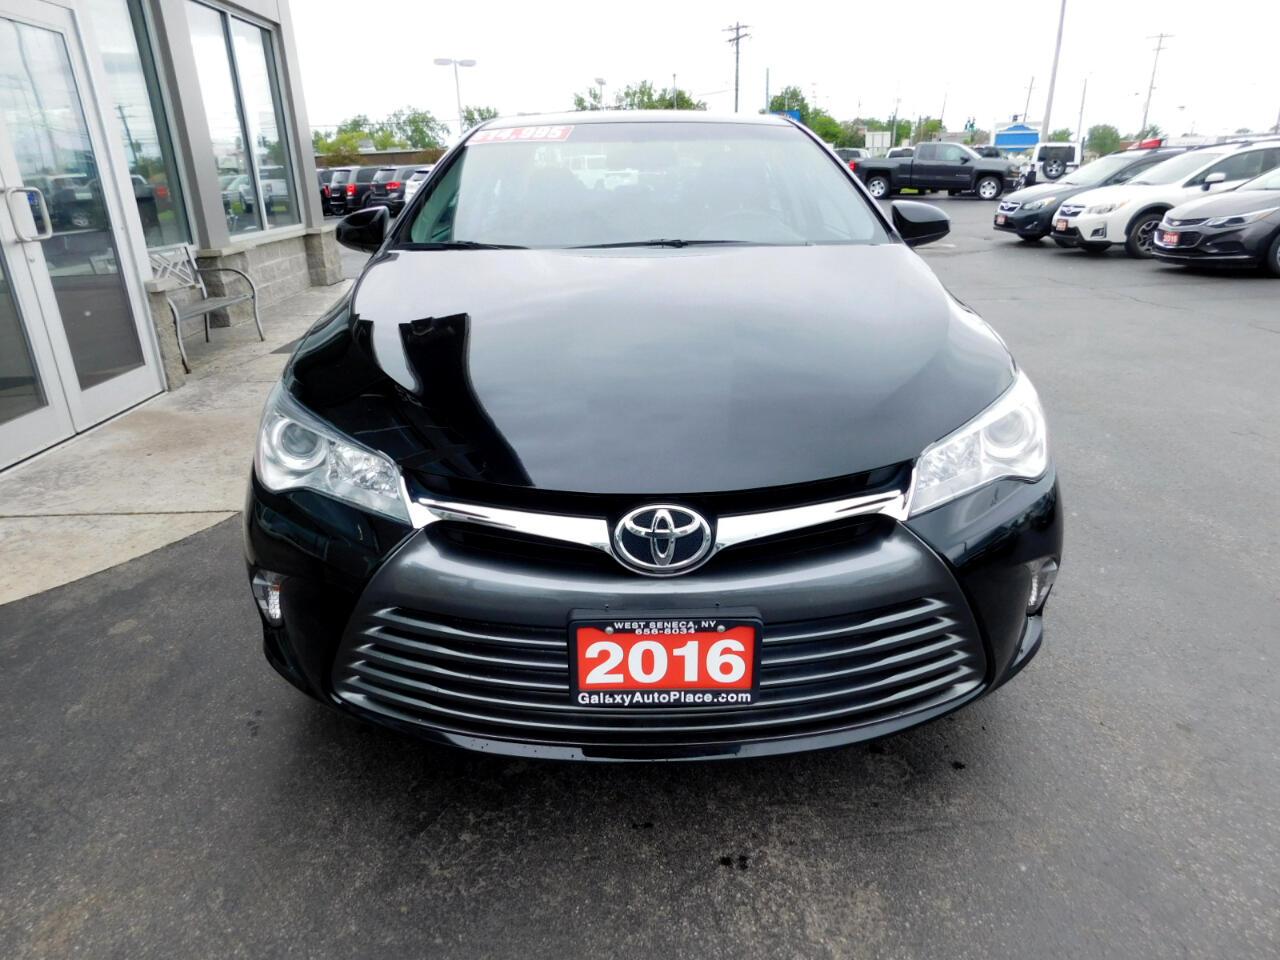 2016 Toyota Camry 4dr Sdn LE Auto